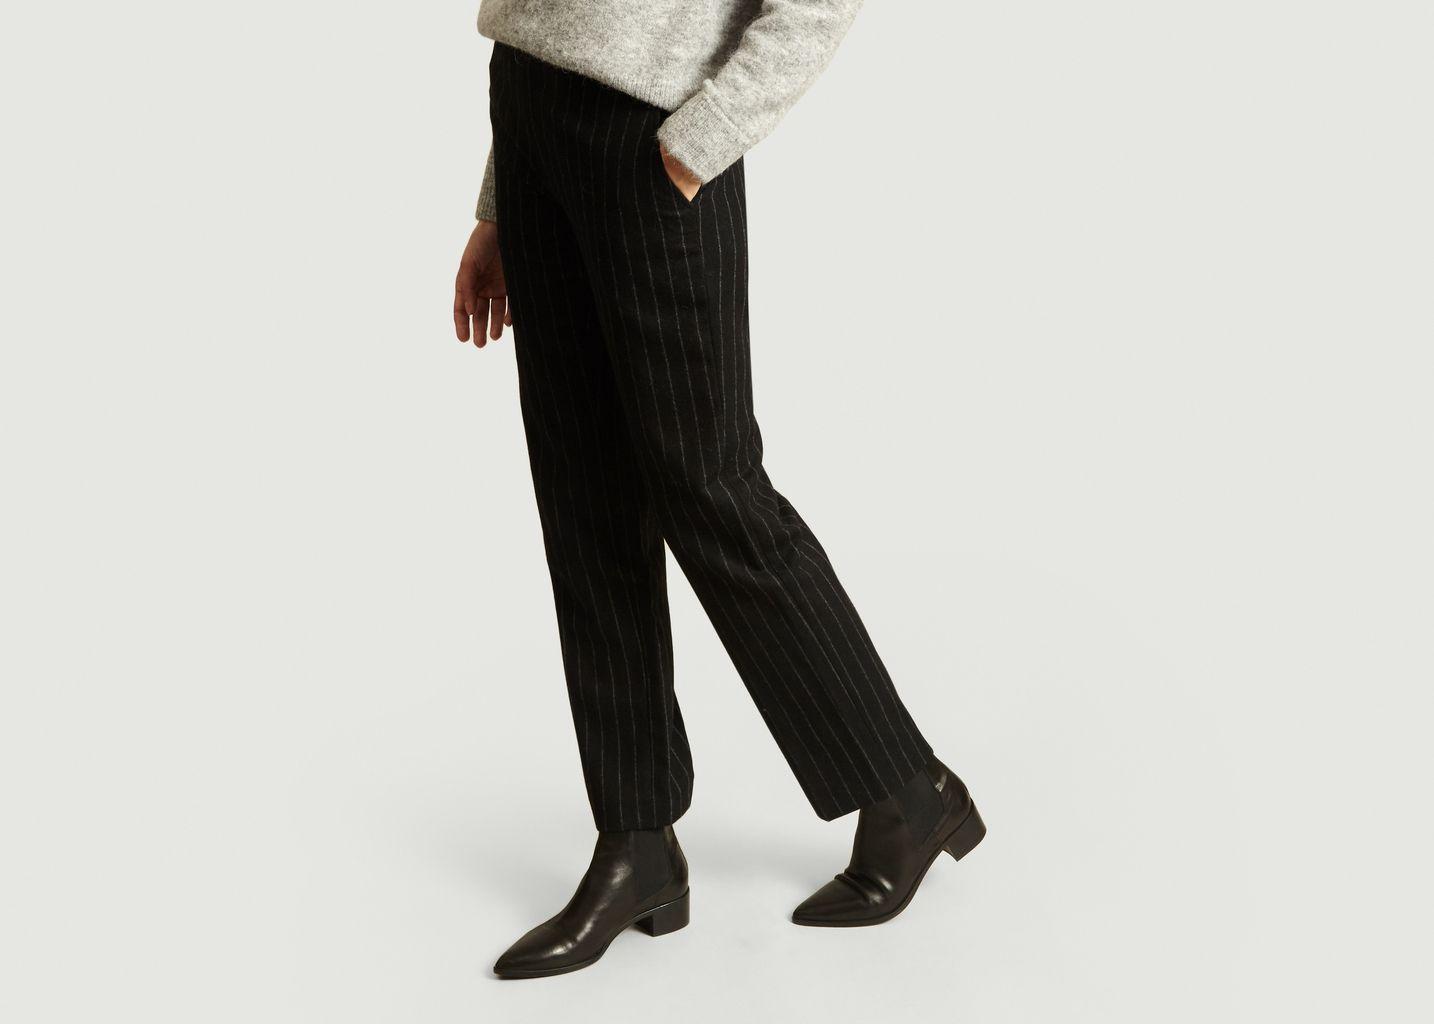 Pantalon Droit - Laquintane